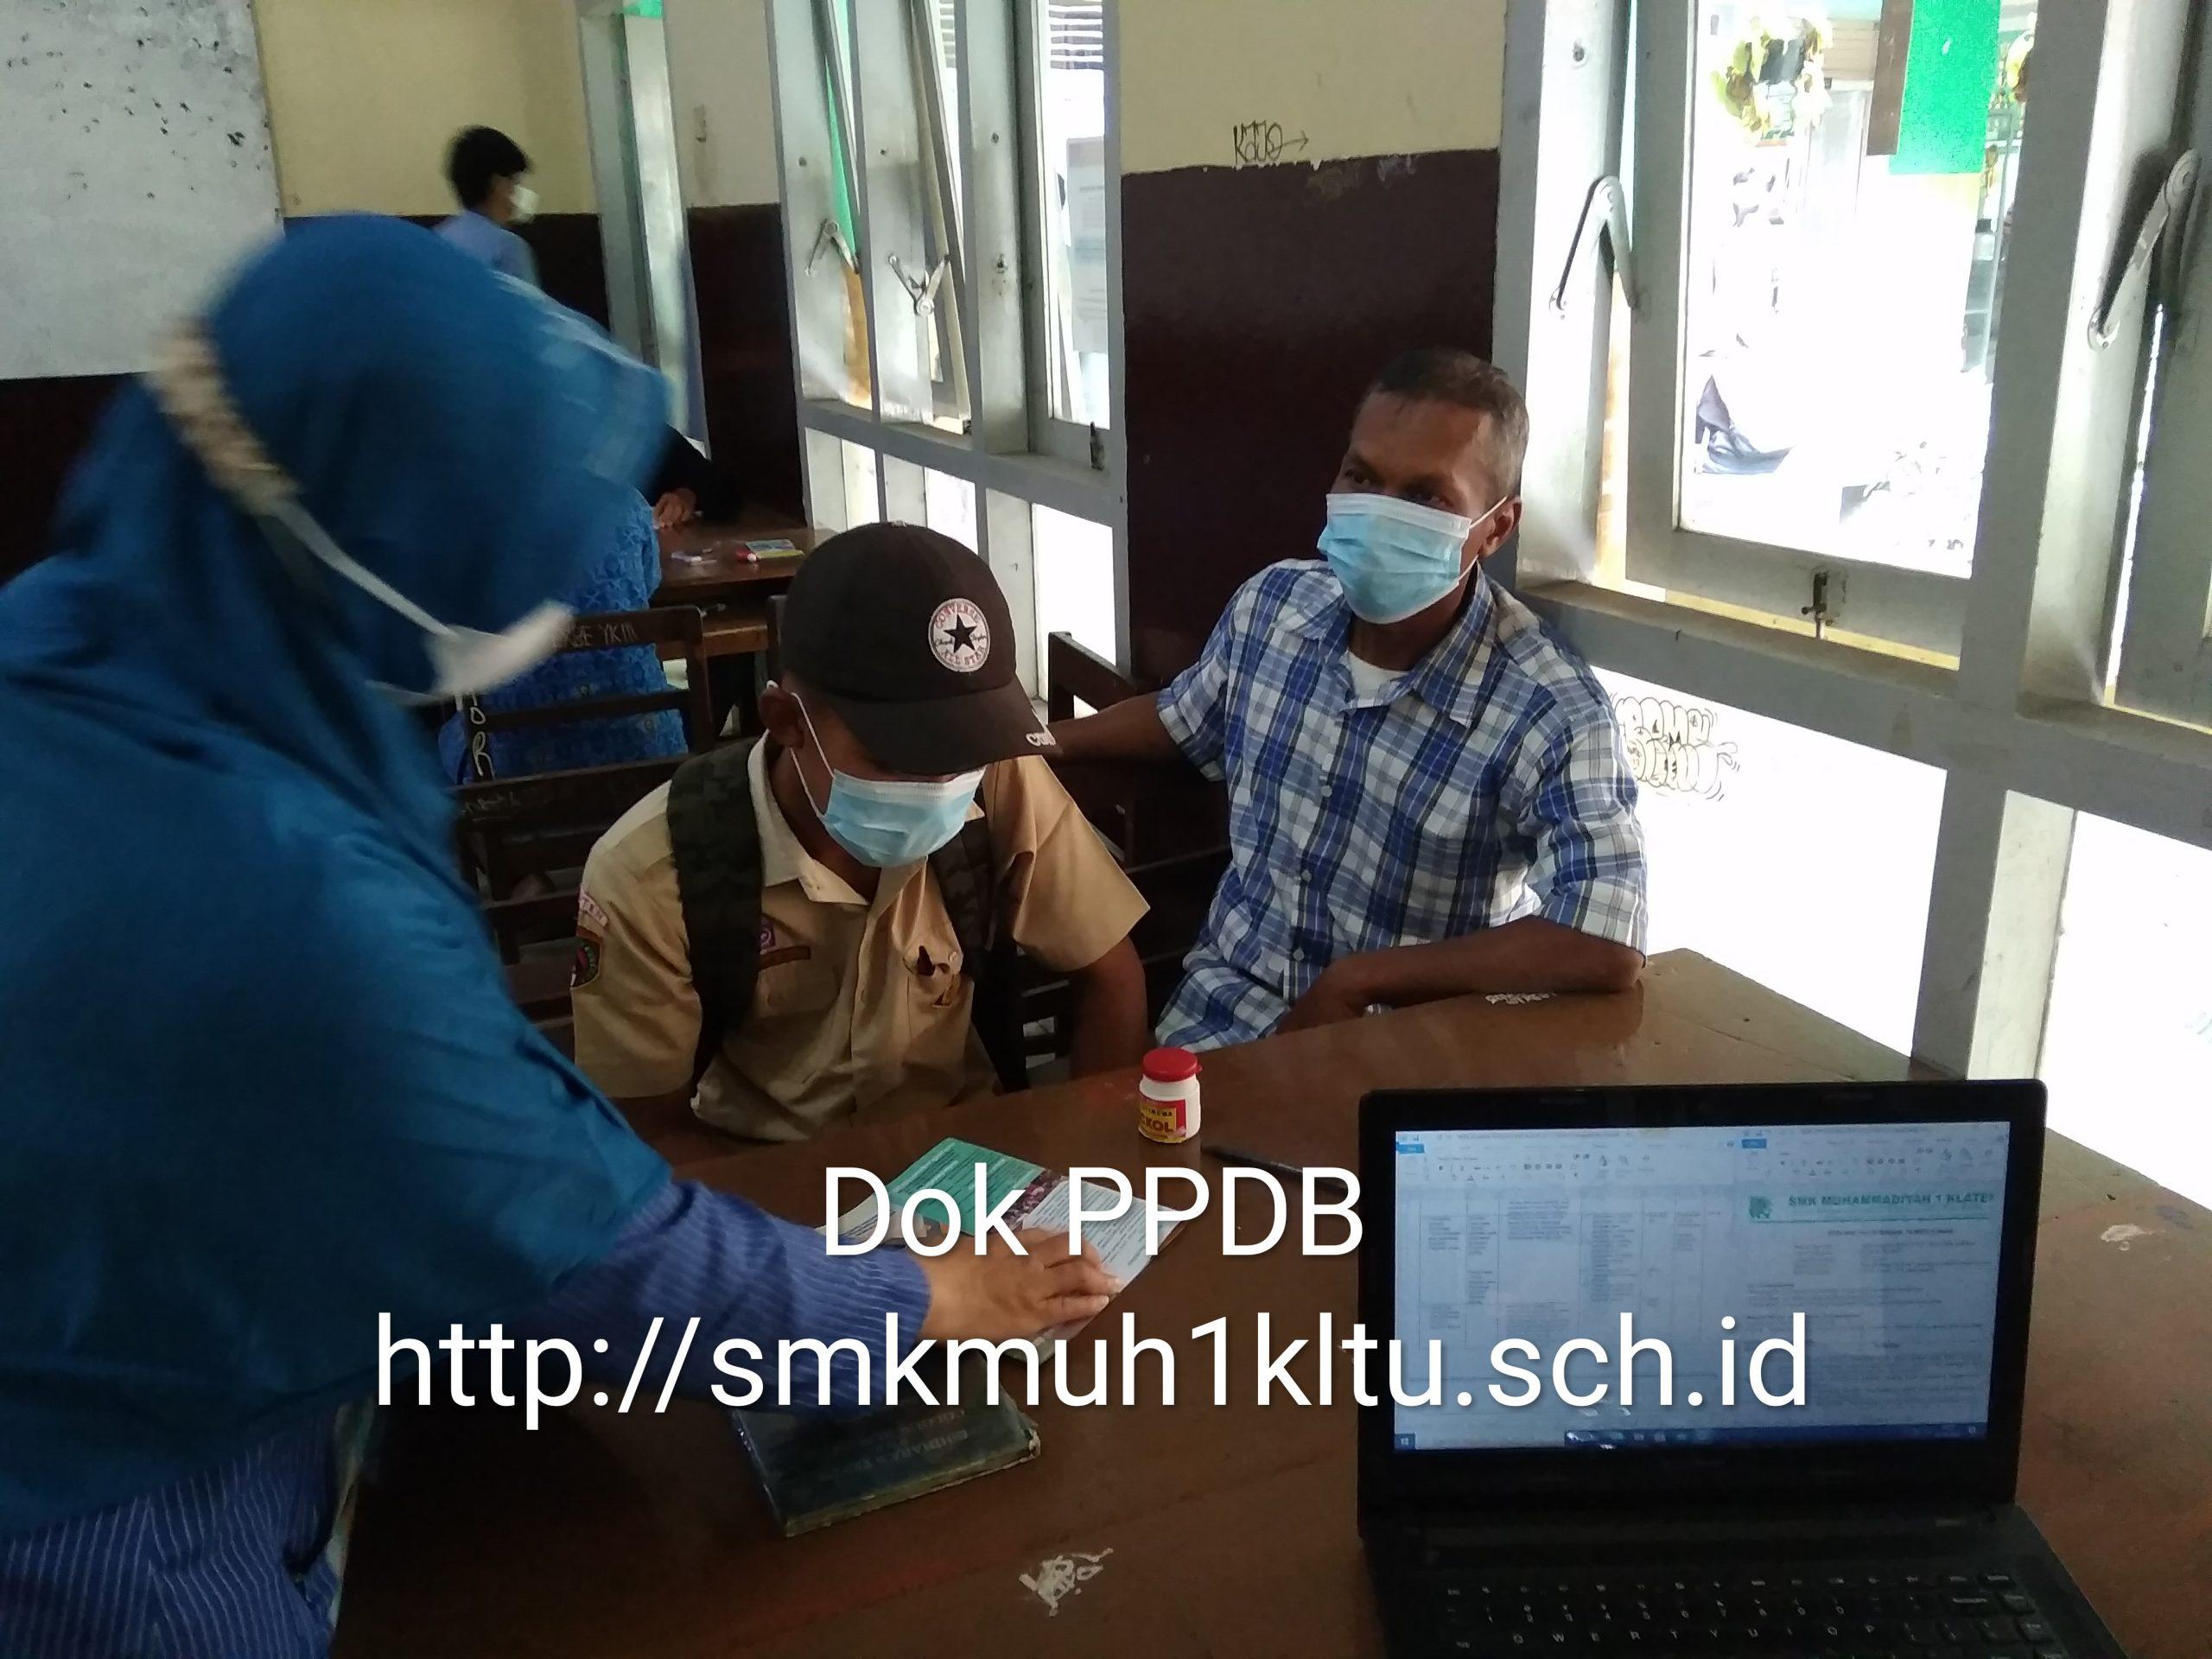 Daftar ulang PPDB SMK Musaka secara online